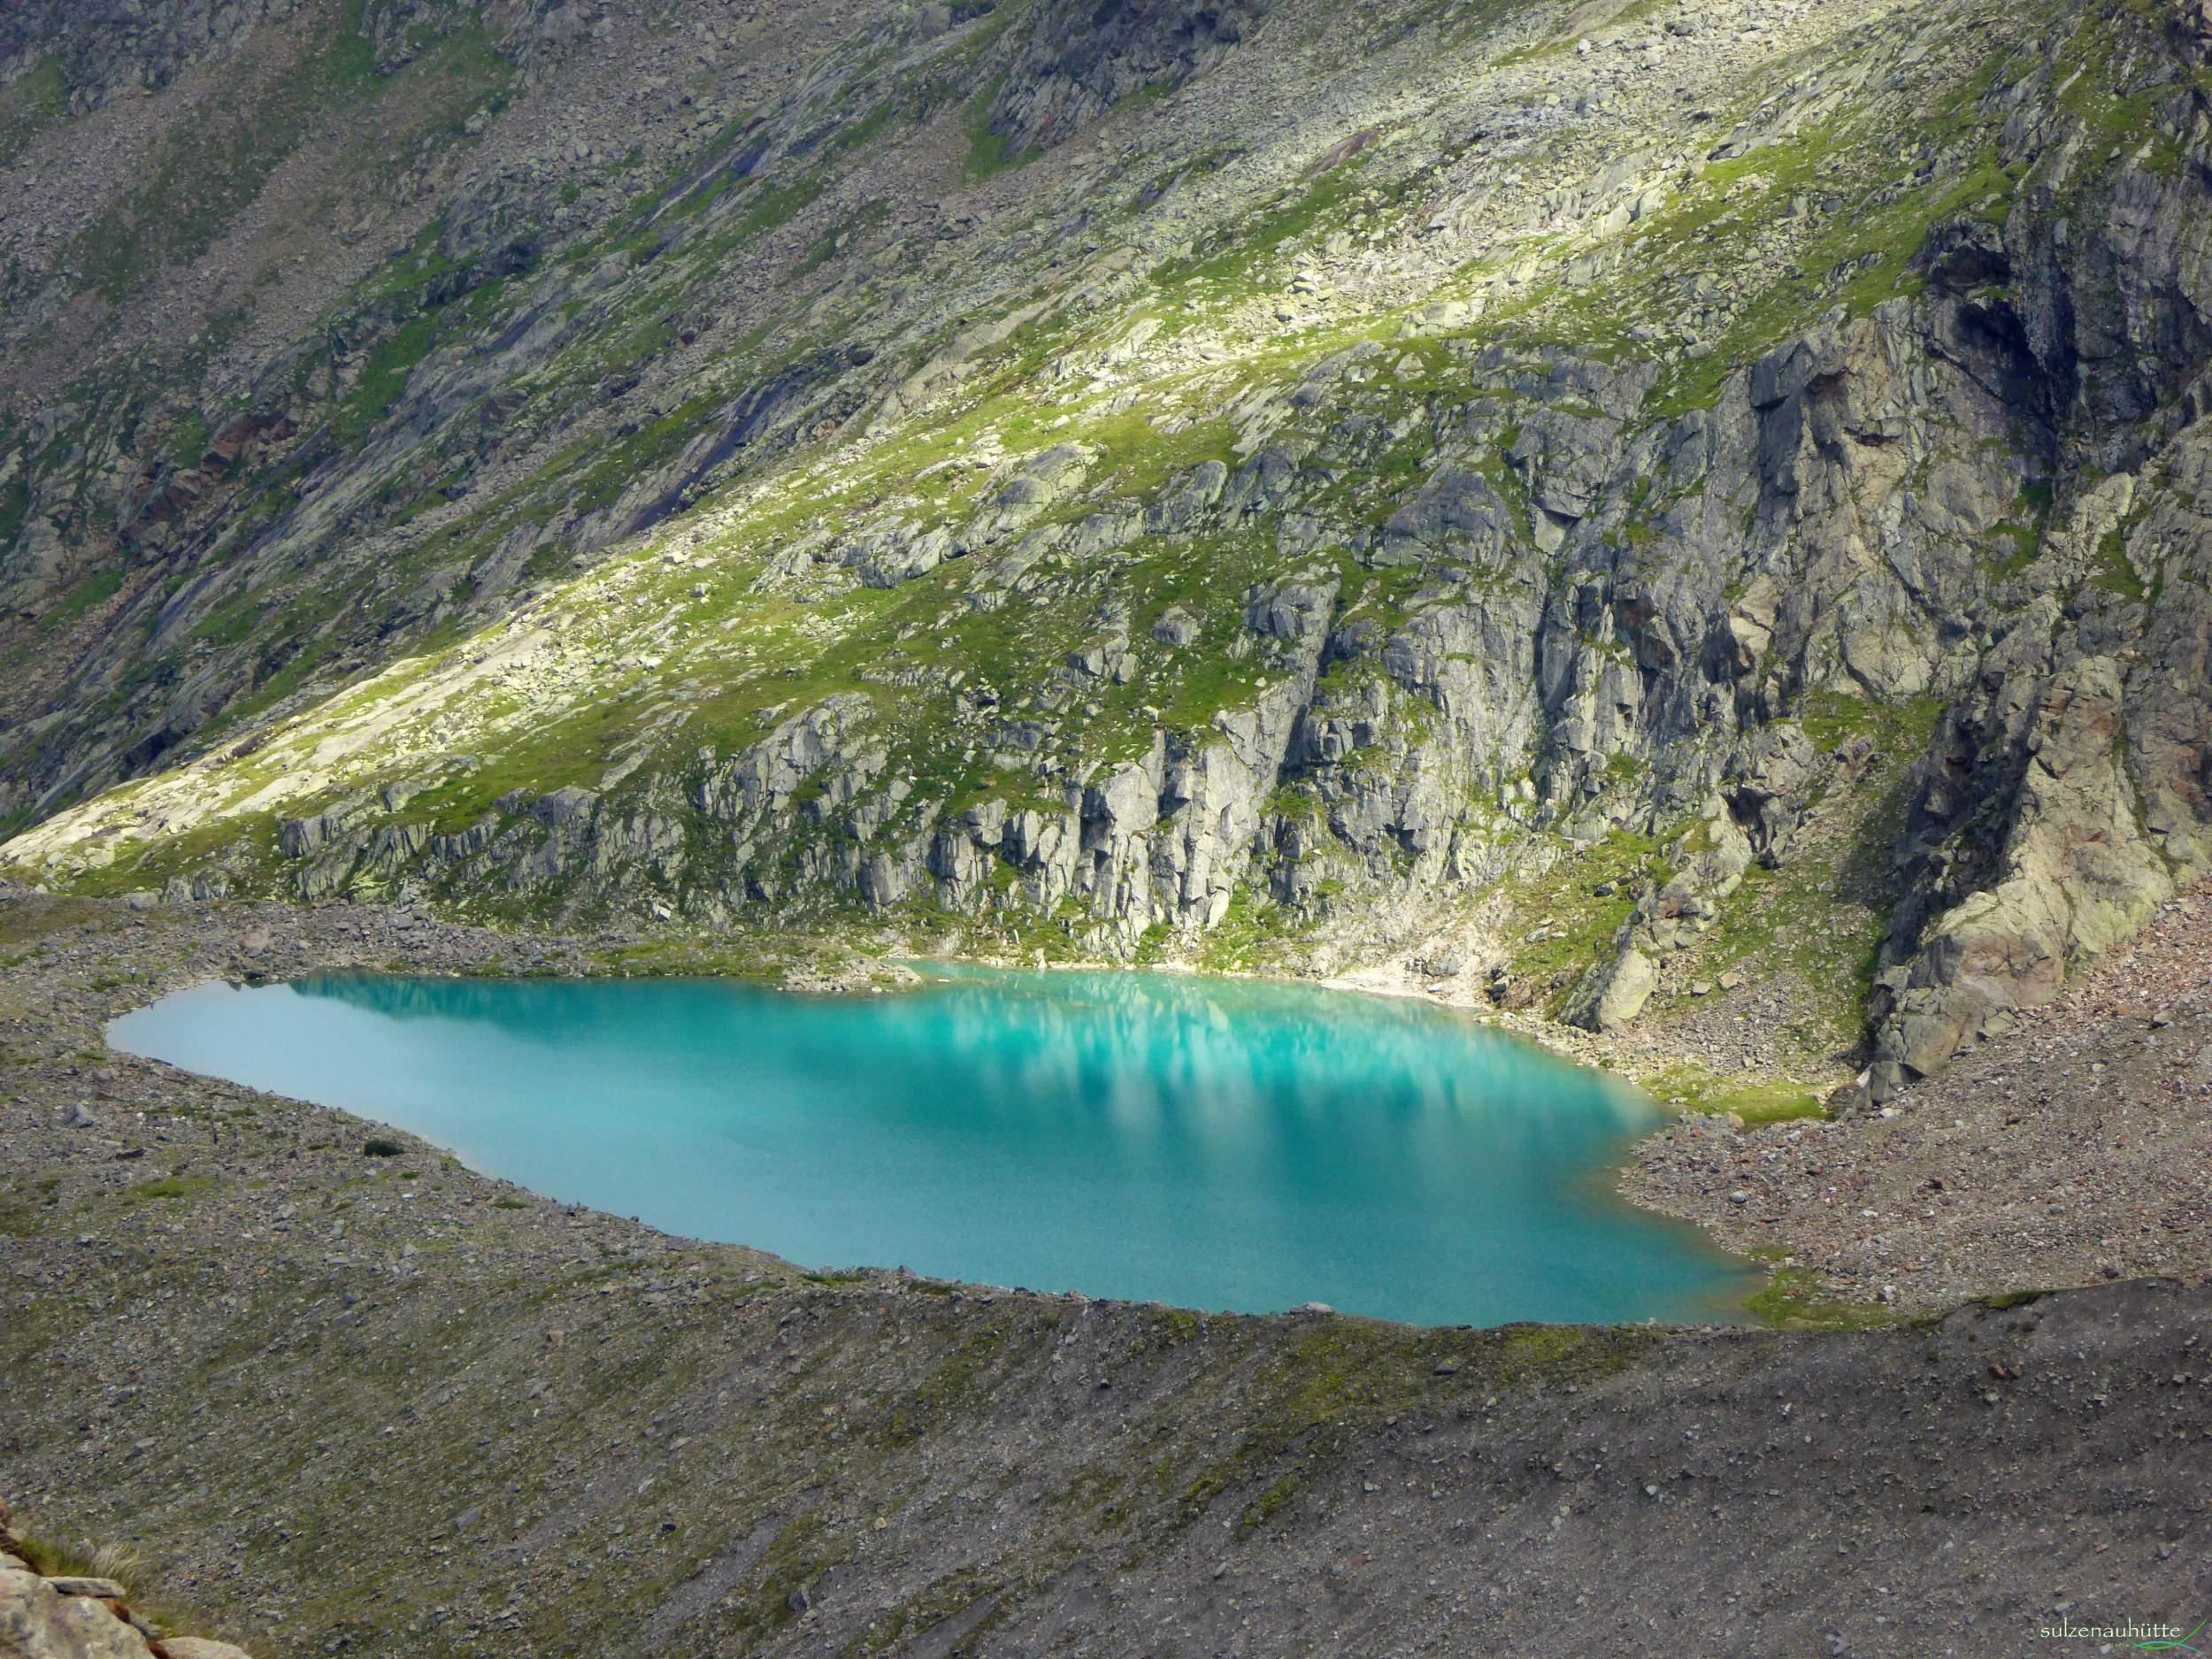 Blaue Lacke - Stubaier Höhenweg